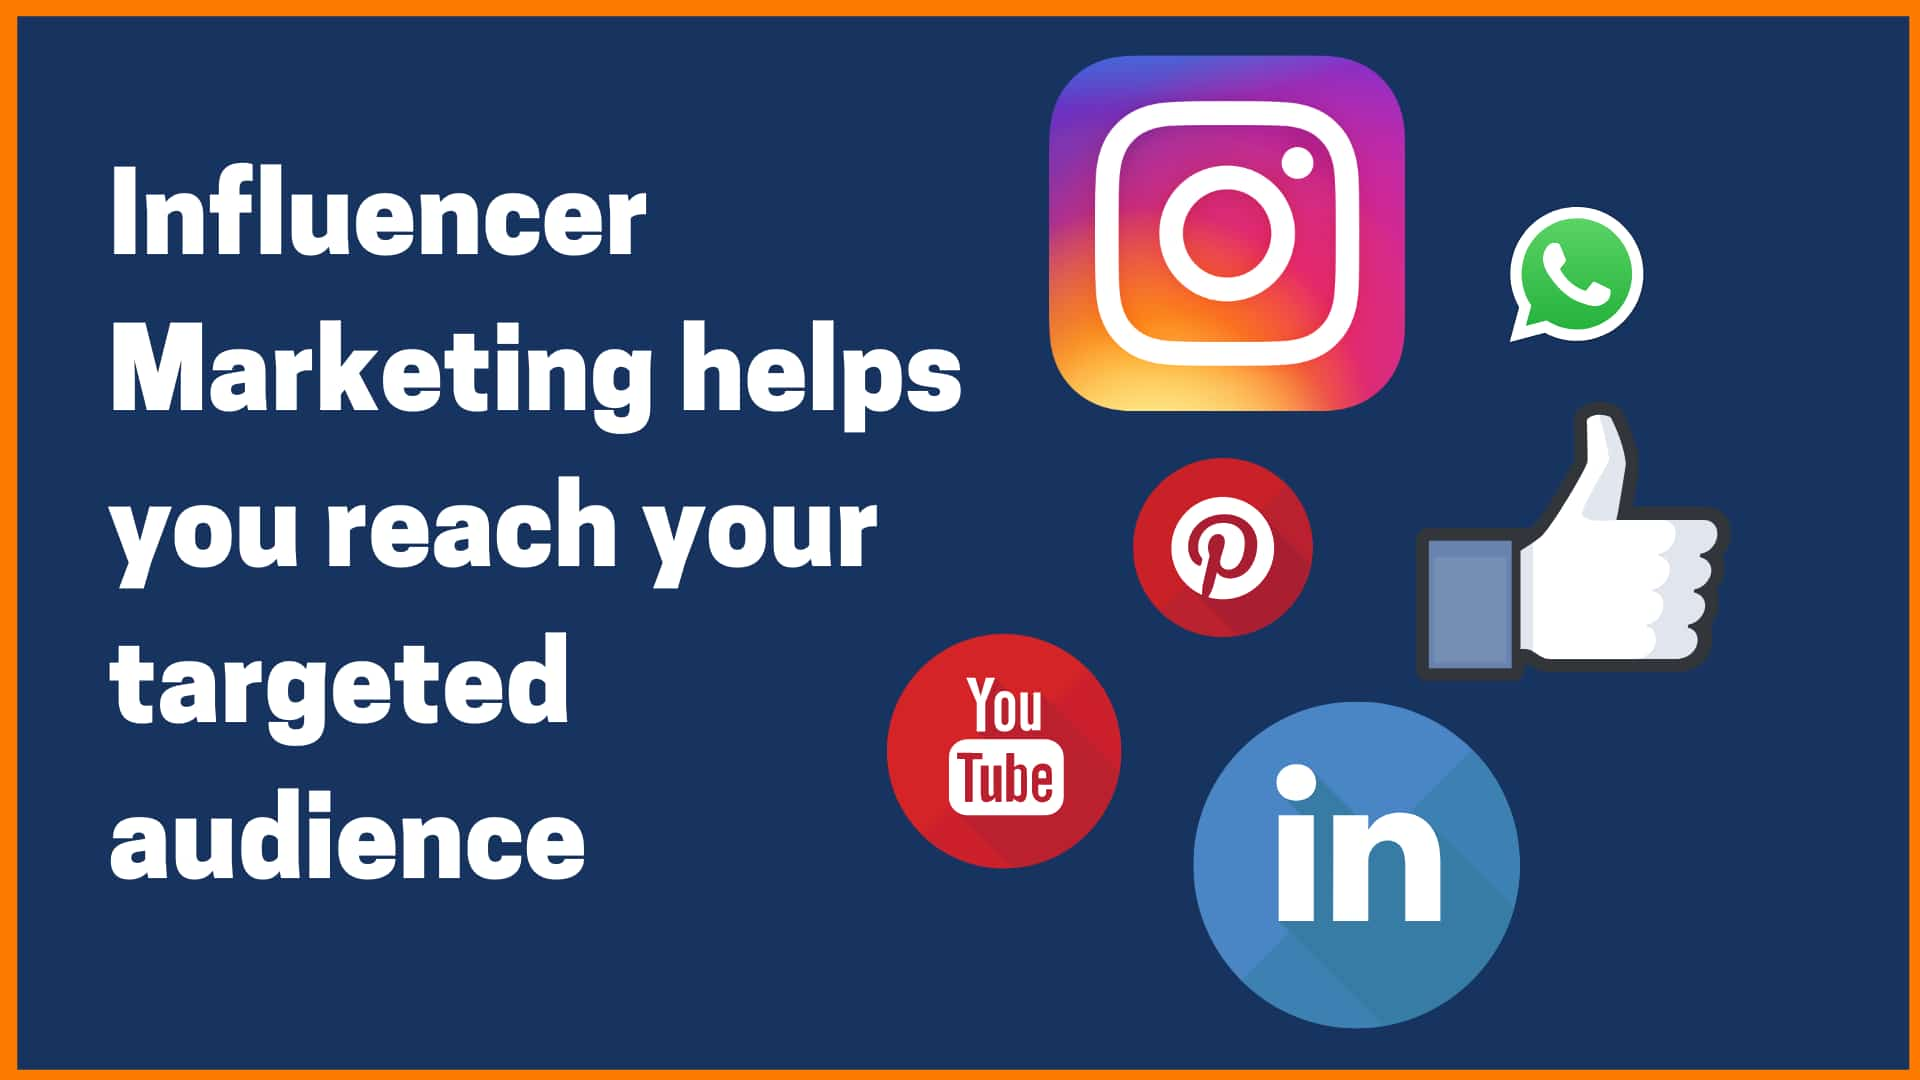 Influencer-Marketing-SaaS-marketing